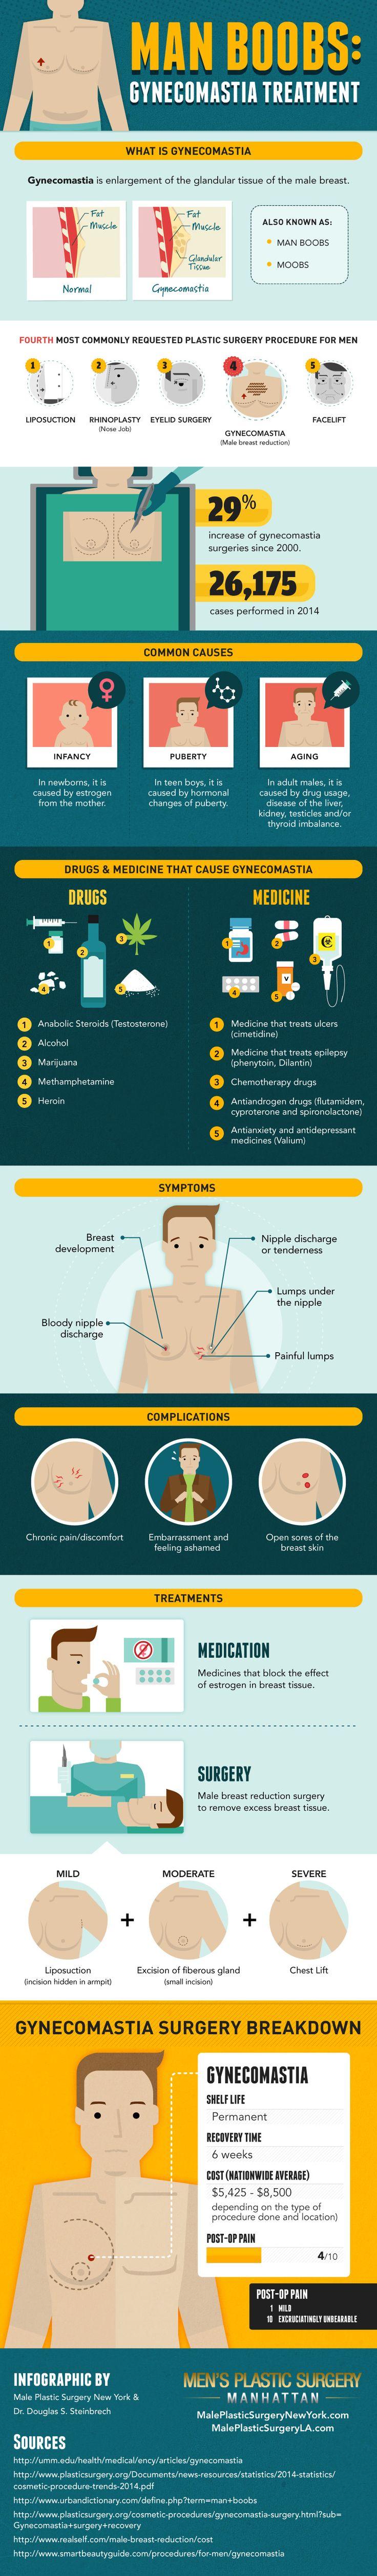 boobies prostate massage adelaide